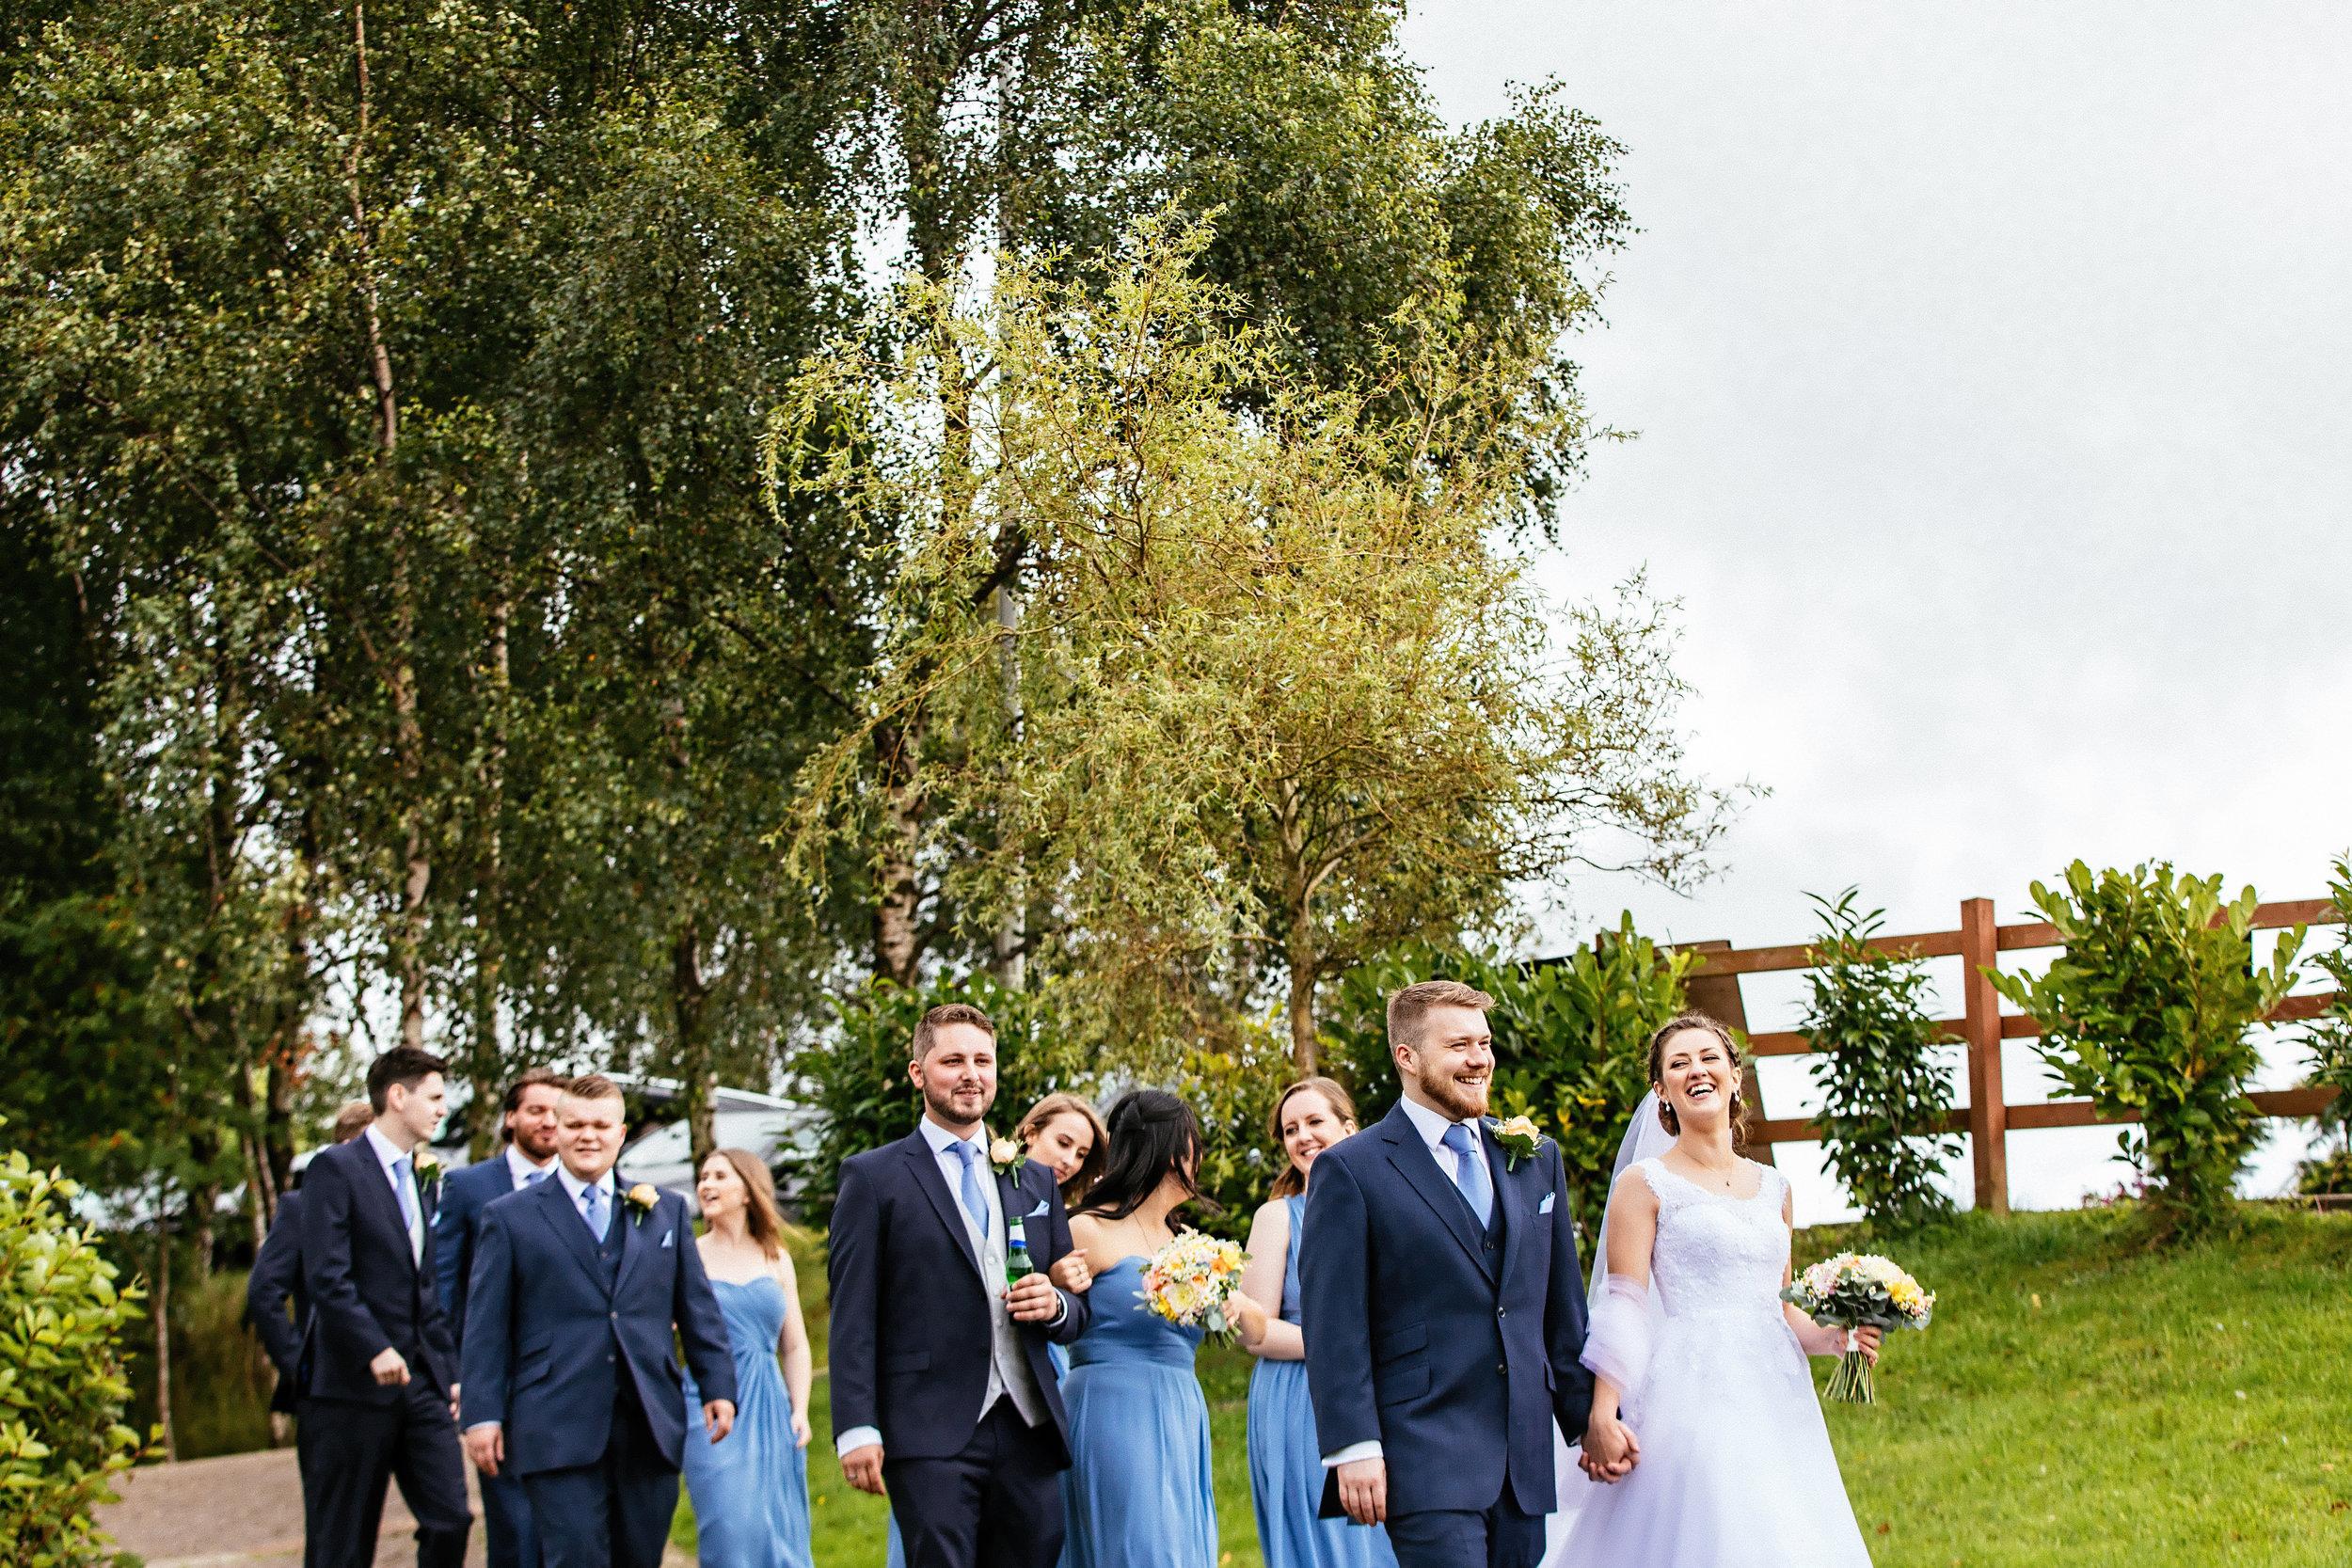 Kathryn-and-Mike-Wedding-Highlights-50.jpg